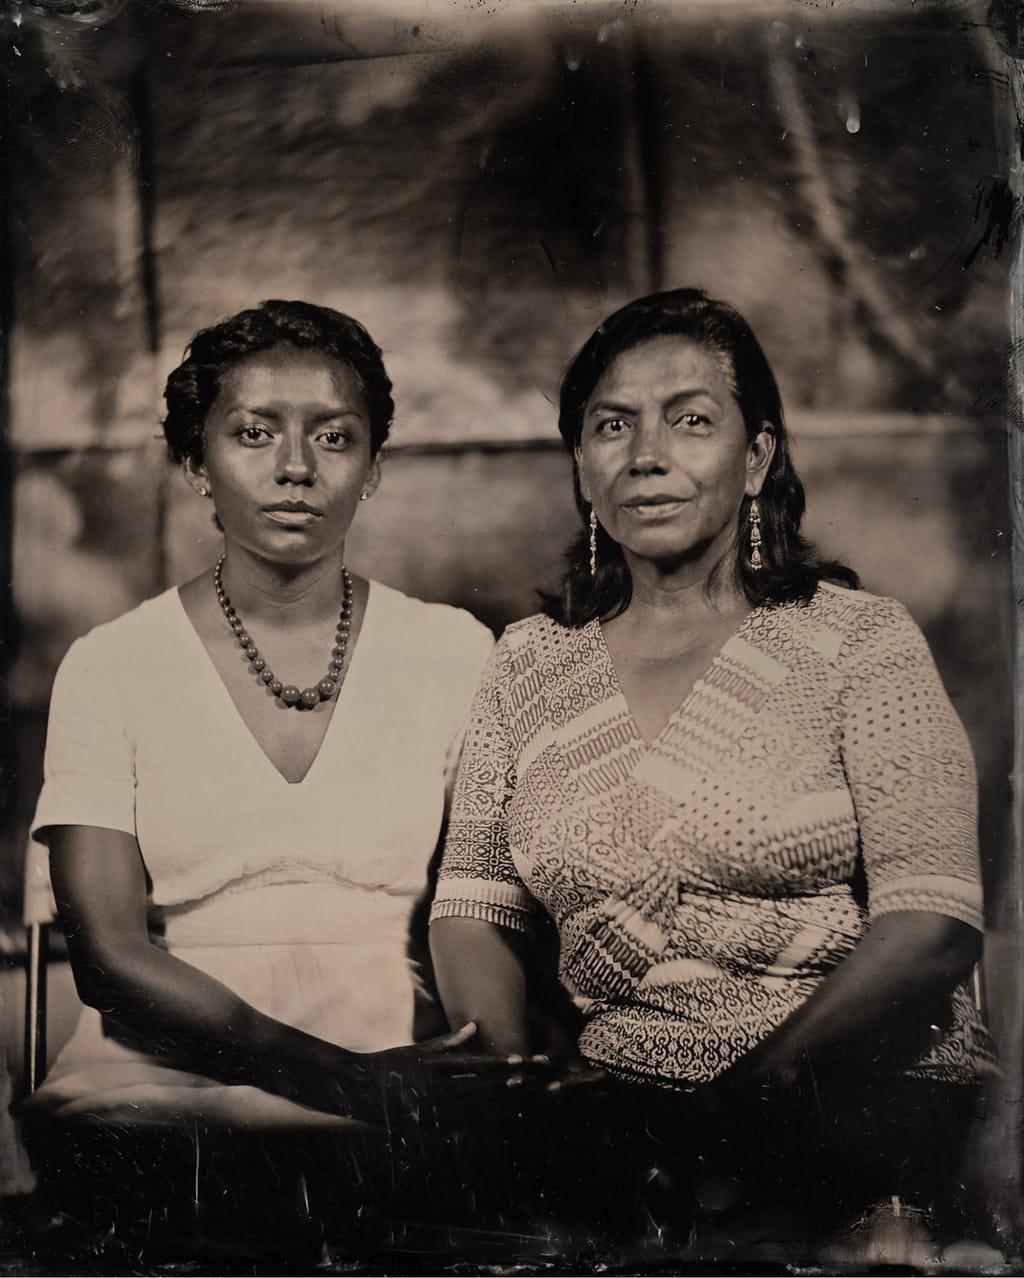 Desireé Beltrán and Maria Elena Beltrán. CIPX 516Arts, 2016.